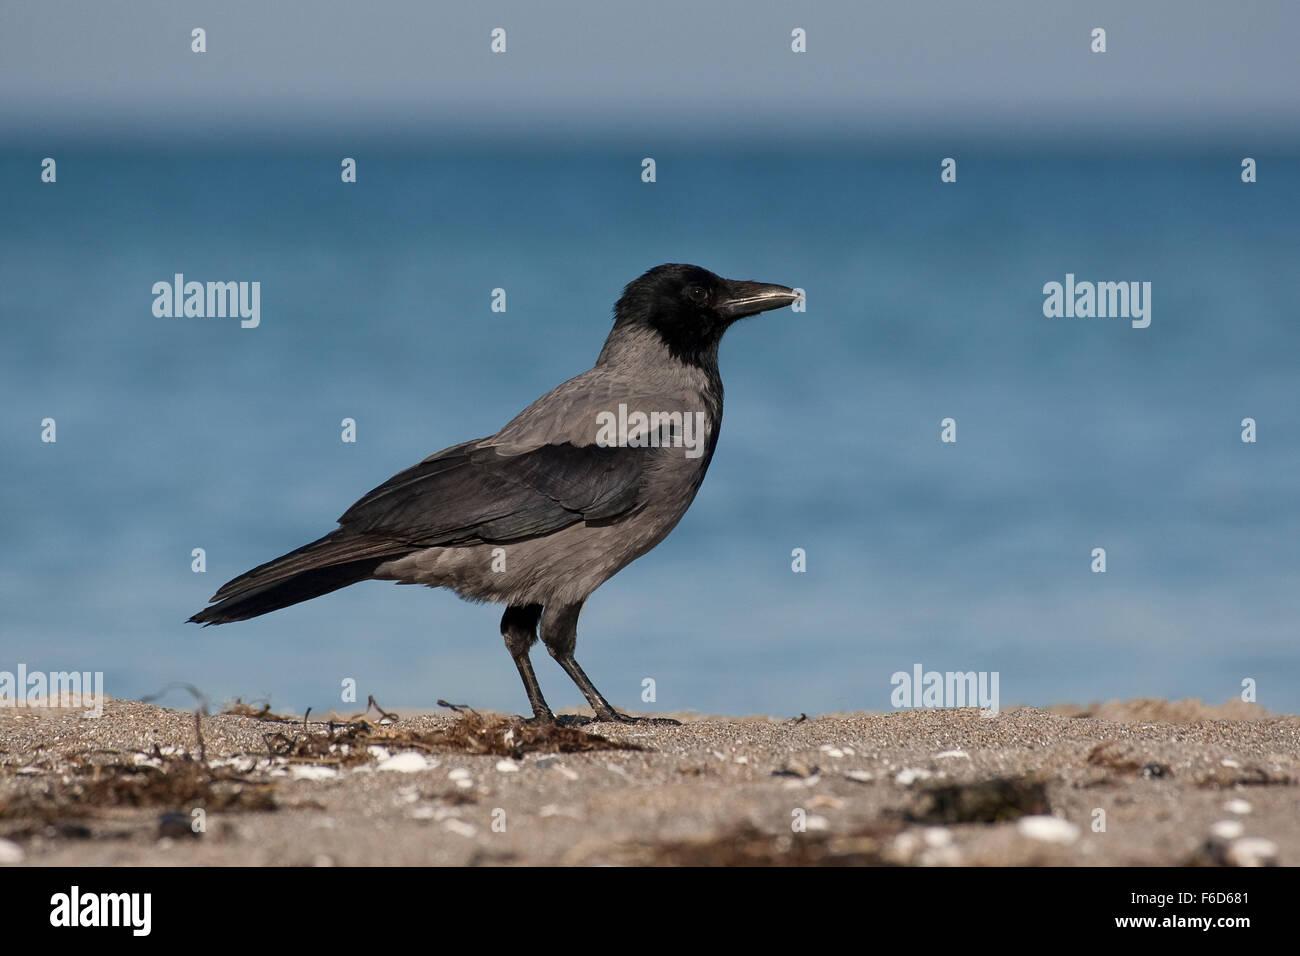 Carrion Crow, crows, Nebelkrähe, Nebel-Krähe, Aaskrähe, Aas-Krähe, Krähe, Krähen, - Stock Image